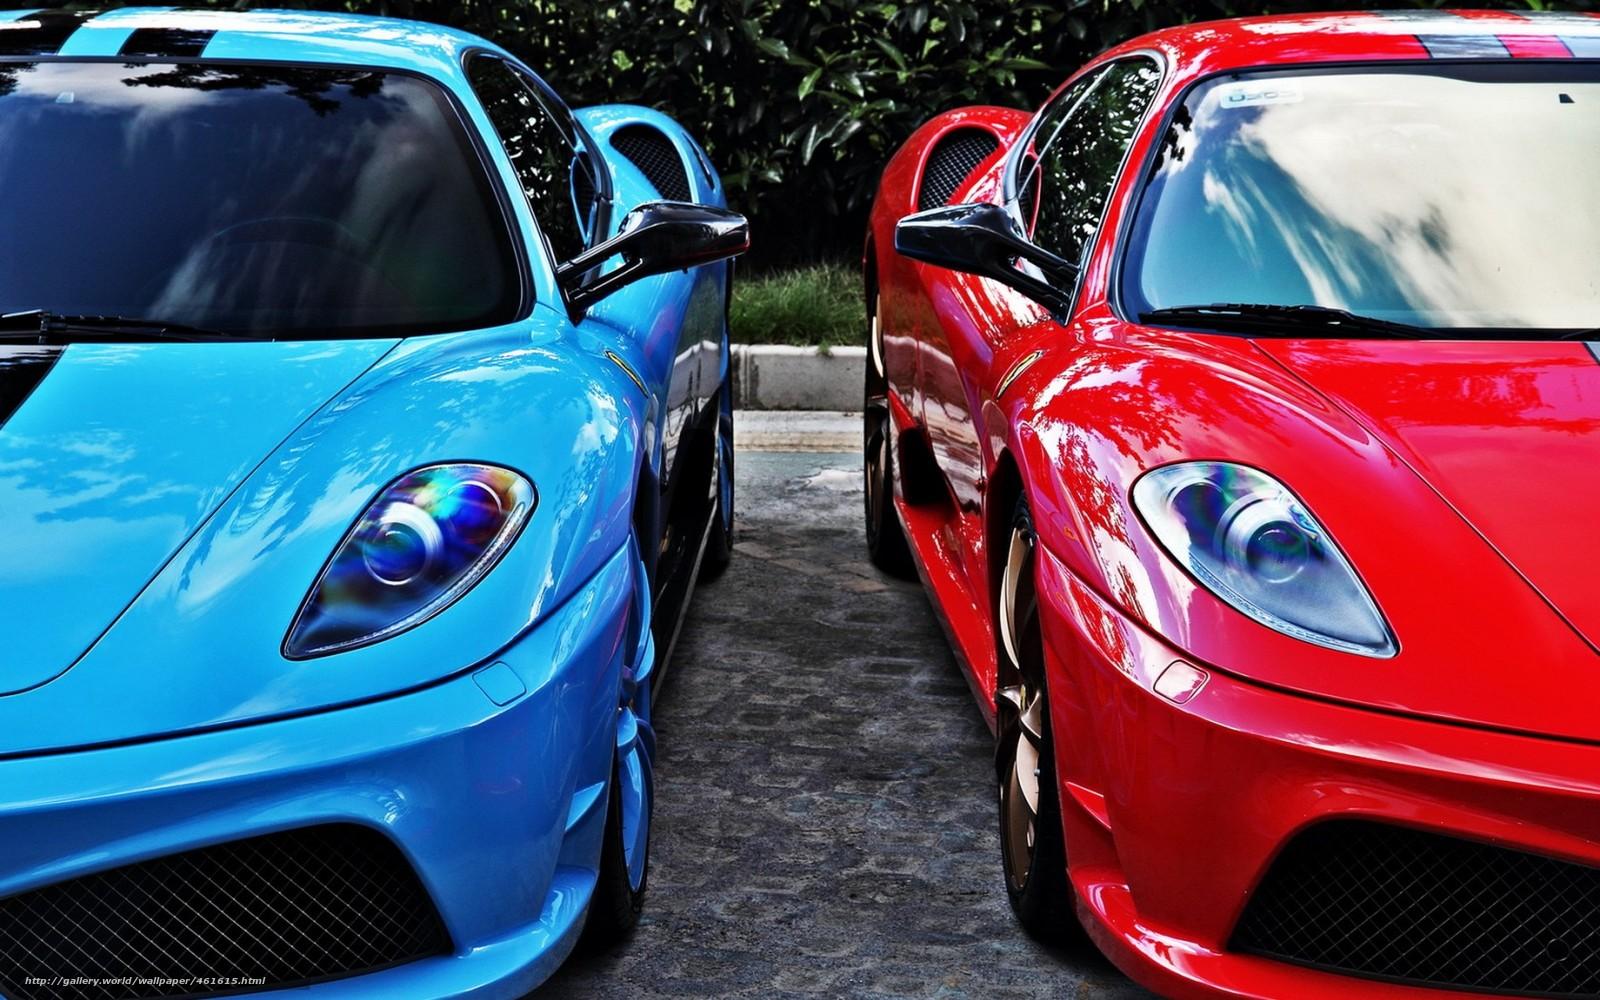 Delightful Blue Sports Cars #2: 461615_krasnyj_goluboj_ferrari_sportkary_Ferrari_1680x1050_(www.GdeFon.ru).jpg